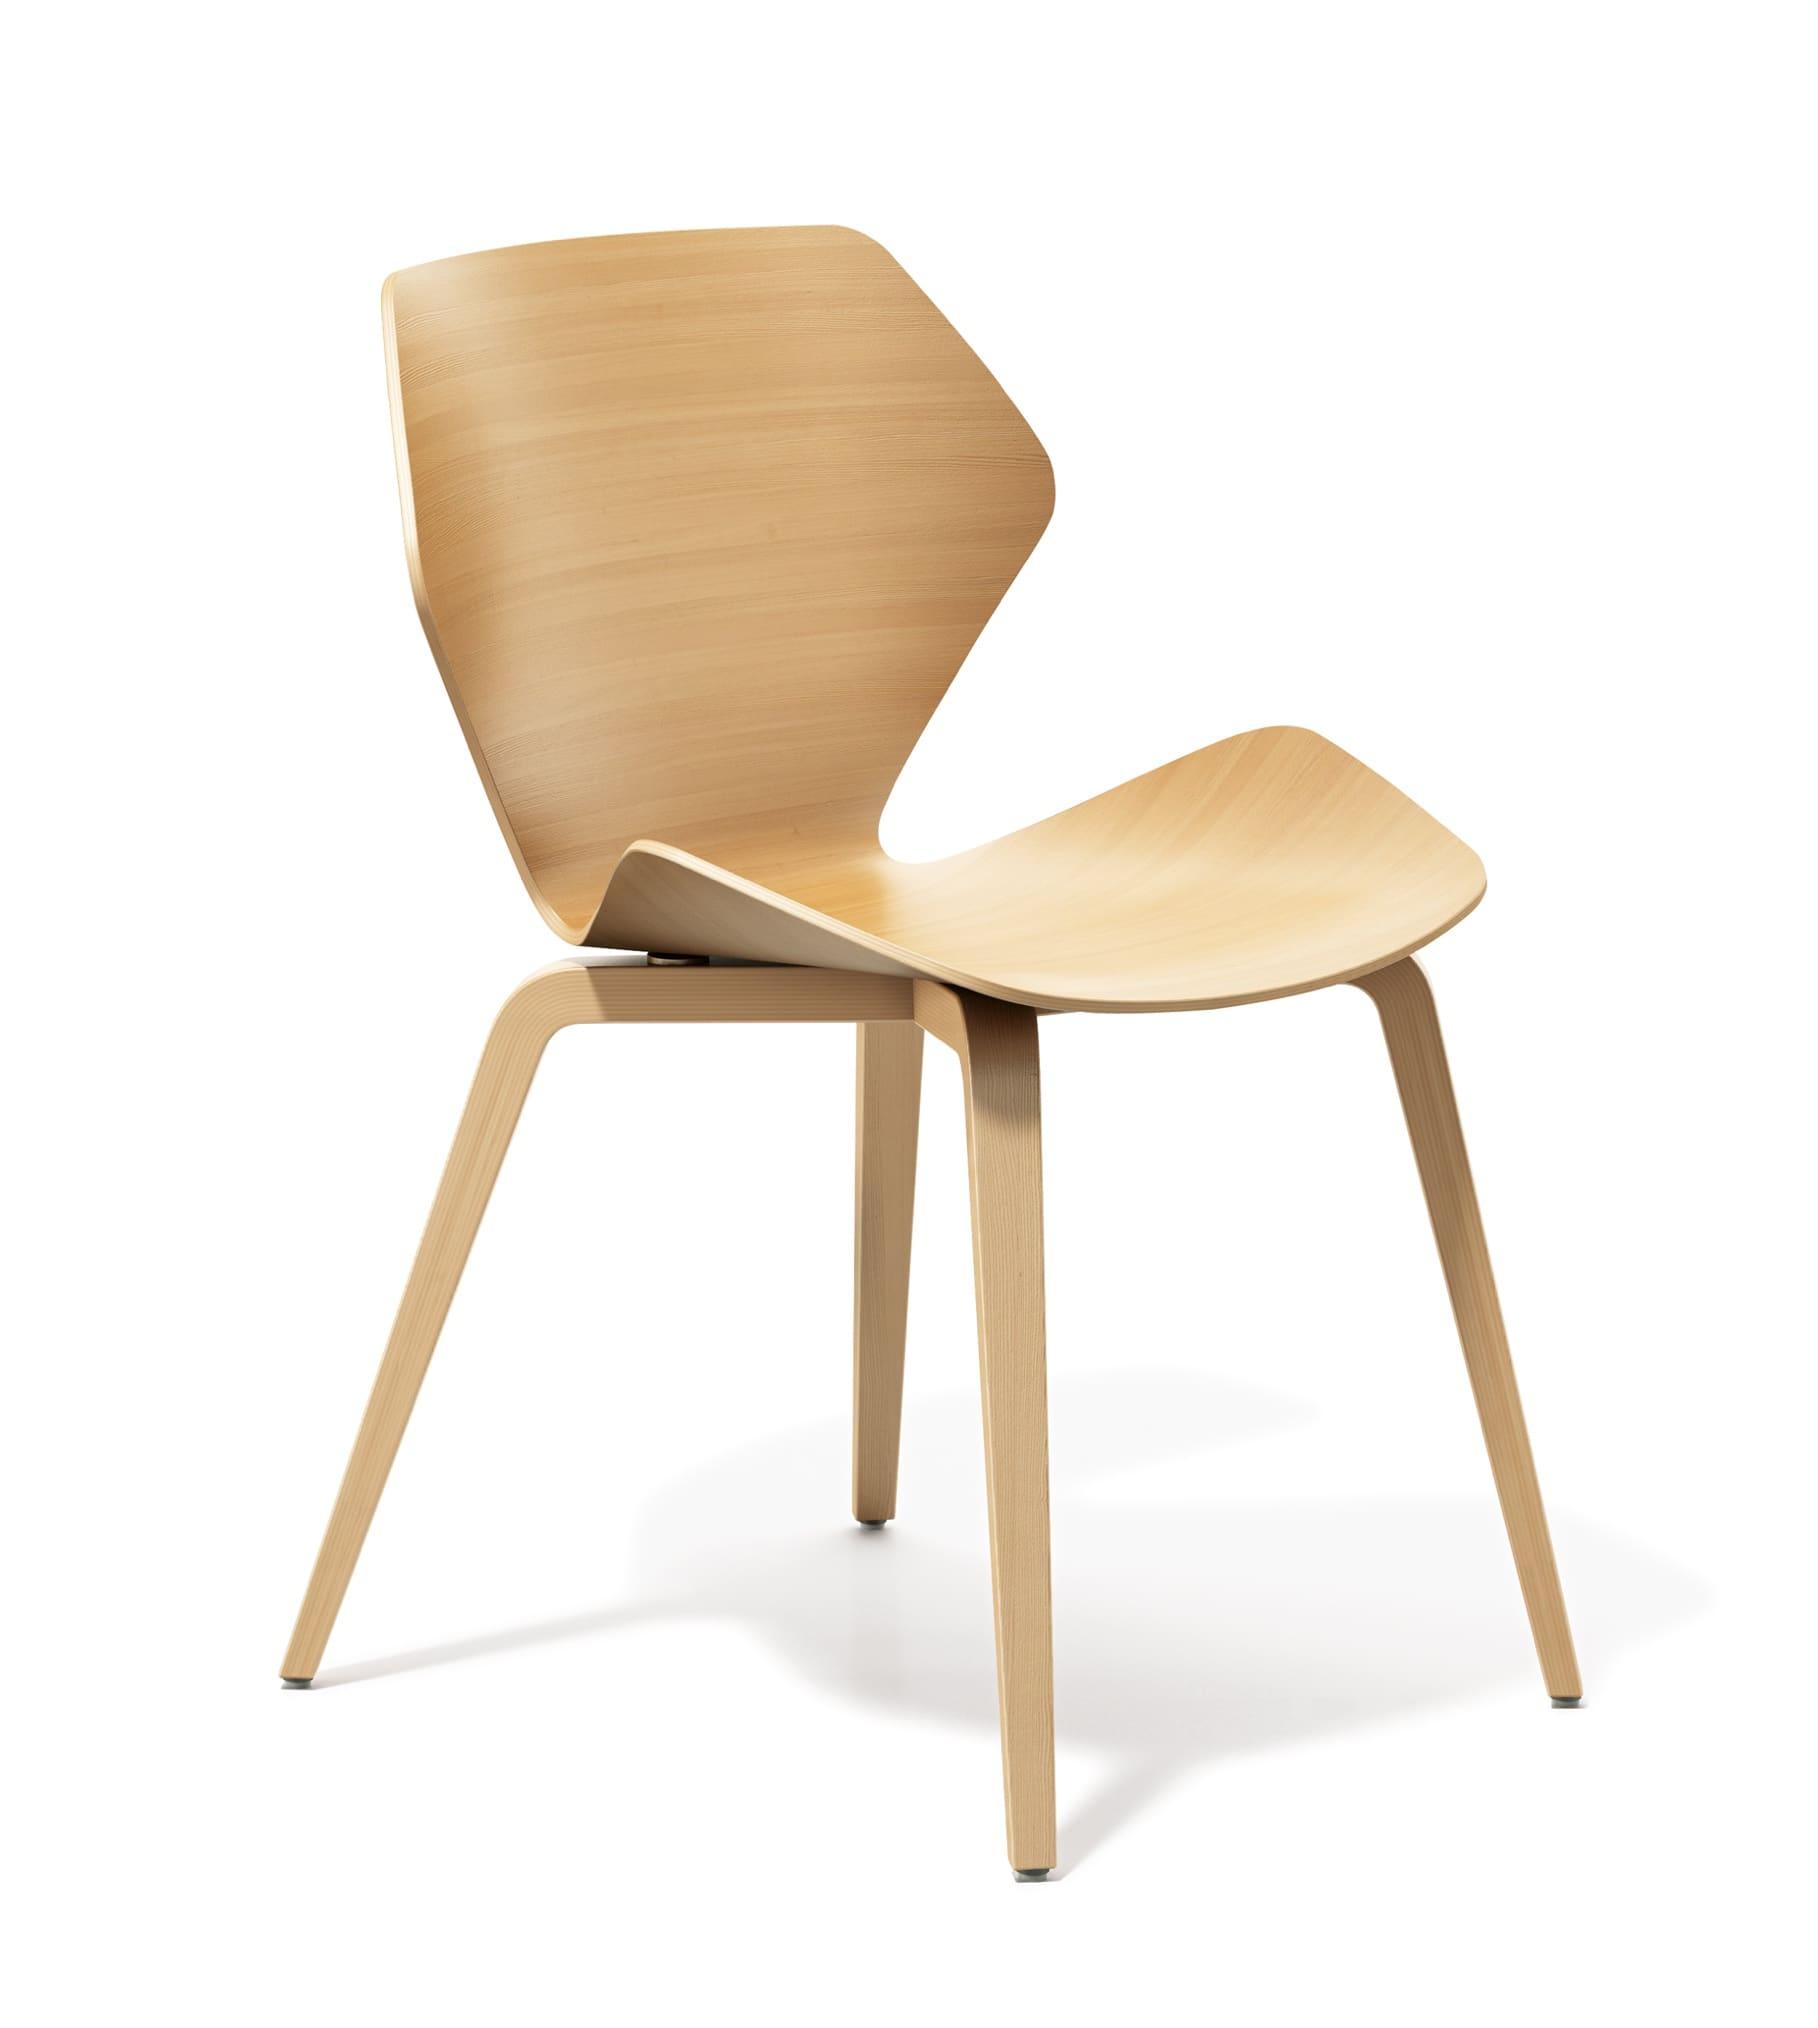 kchensessel finest excellent big sofa mit hocker schlafsofa cady x cm schwarz mit mbel with big. Black Bedroom Furniture Sets. Home Design Ideas